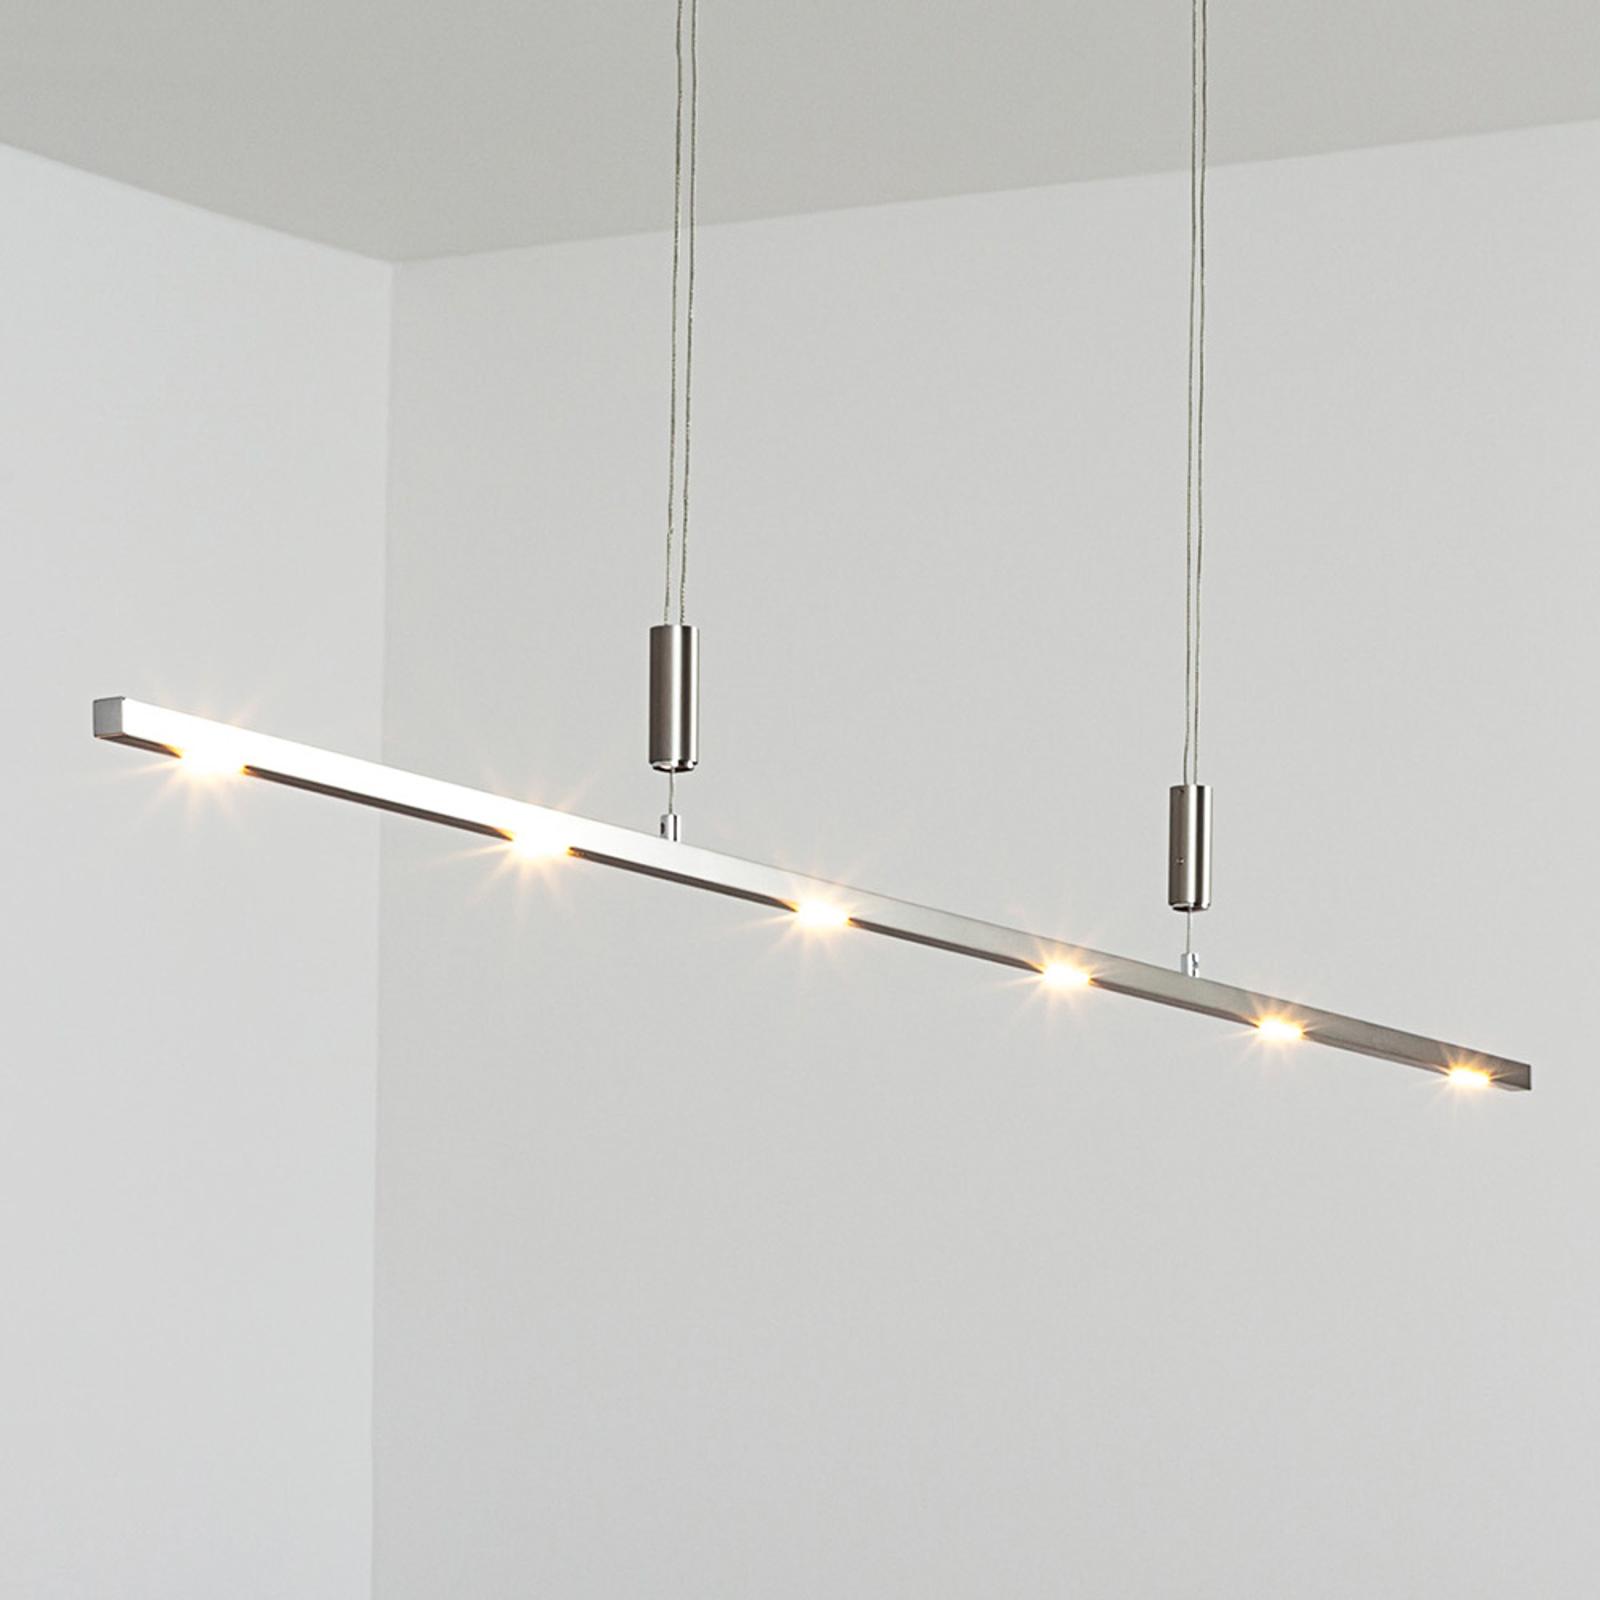 Lampada sospesa a LED Tolu, regol. altezza 140 cm